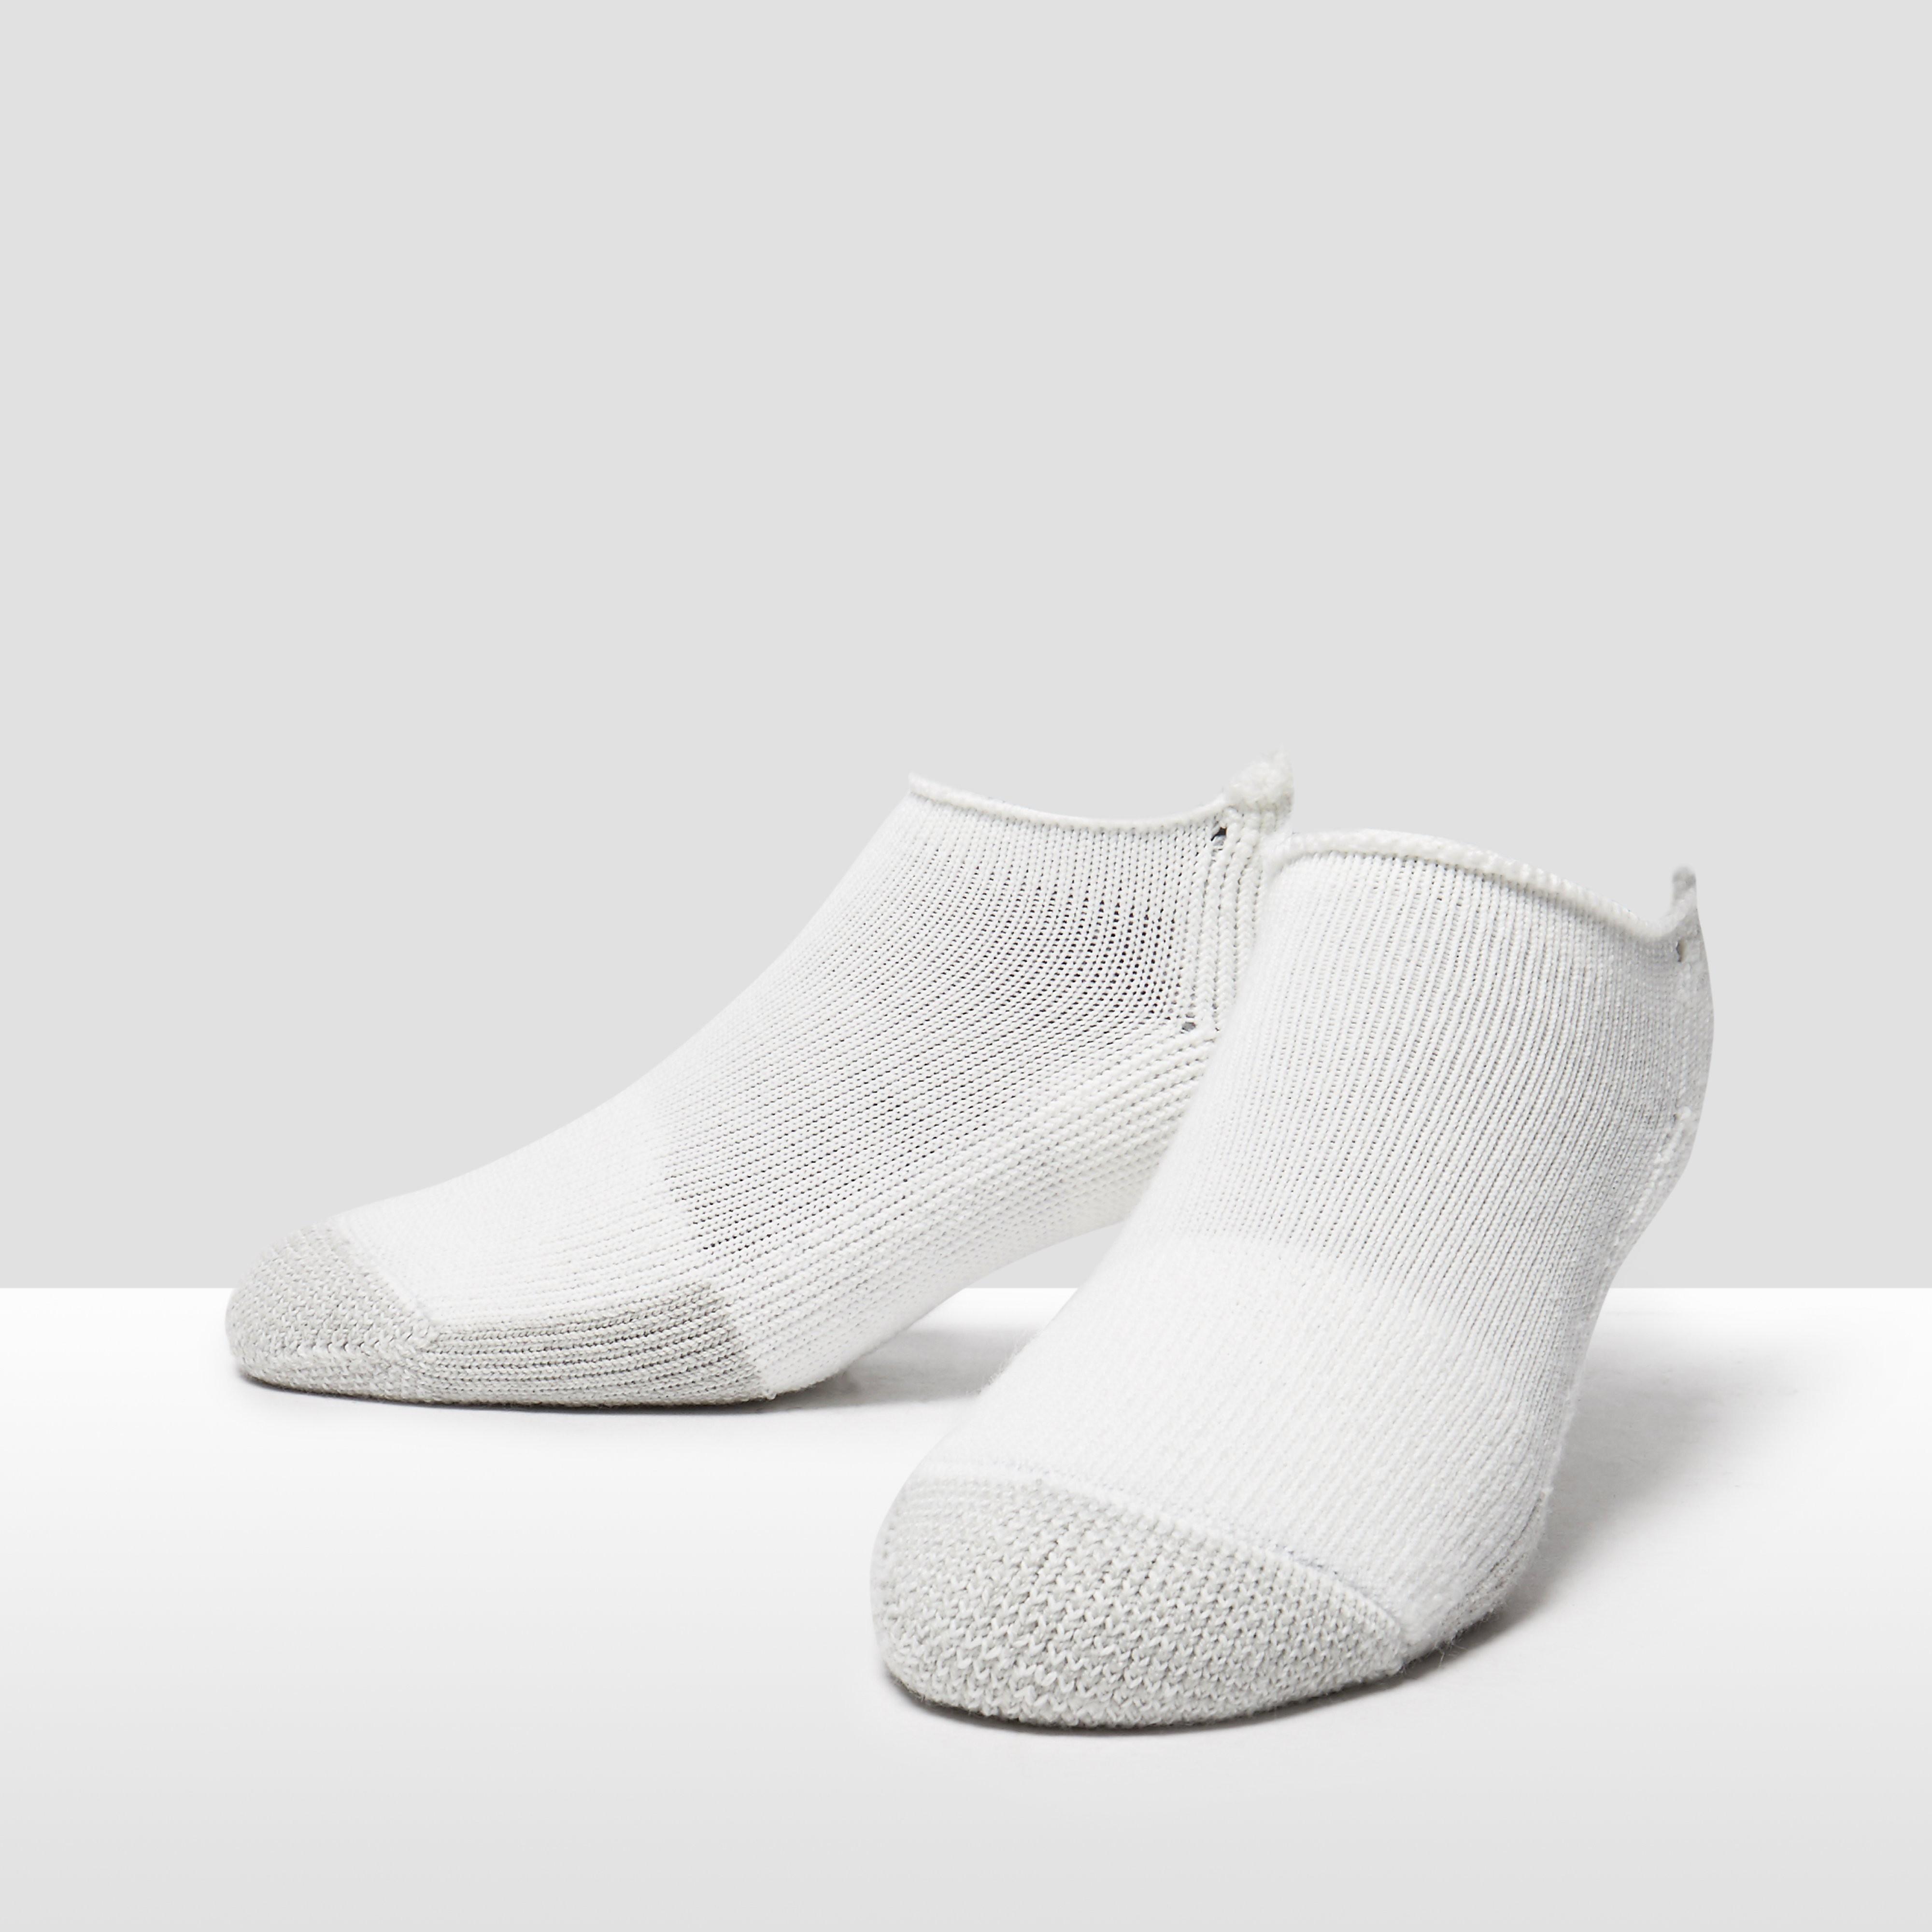 Thorlo Tennis Rolltop Socks